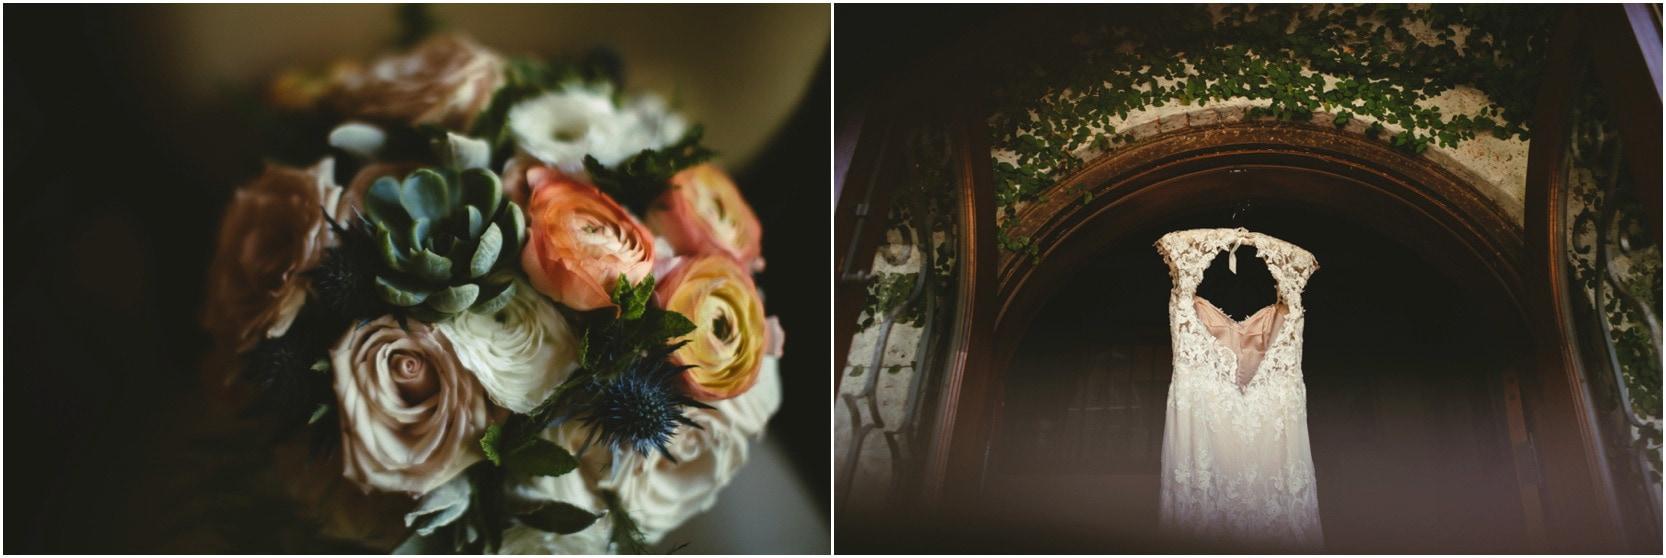 naomijacob_covington_wedding__8_blogstomped